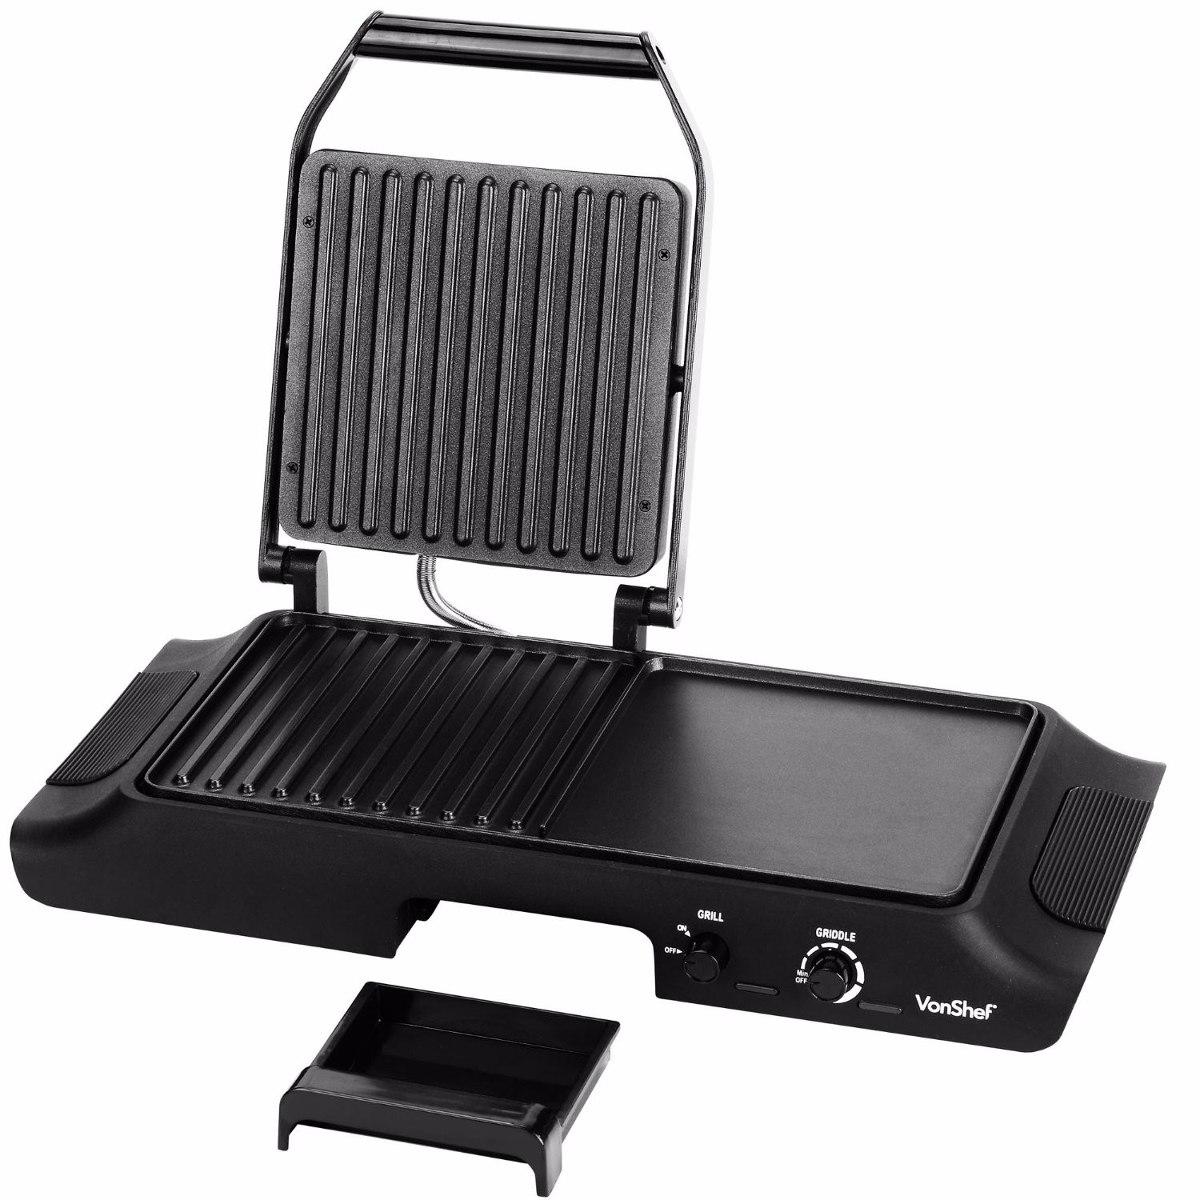 Parrilla electrica grill acero inoxidable plancha asador - Plancha de acero inoxidable precio ...